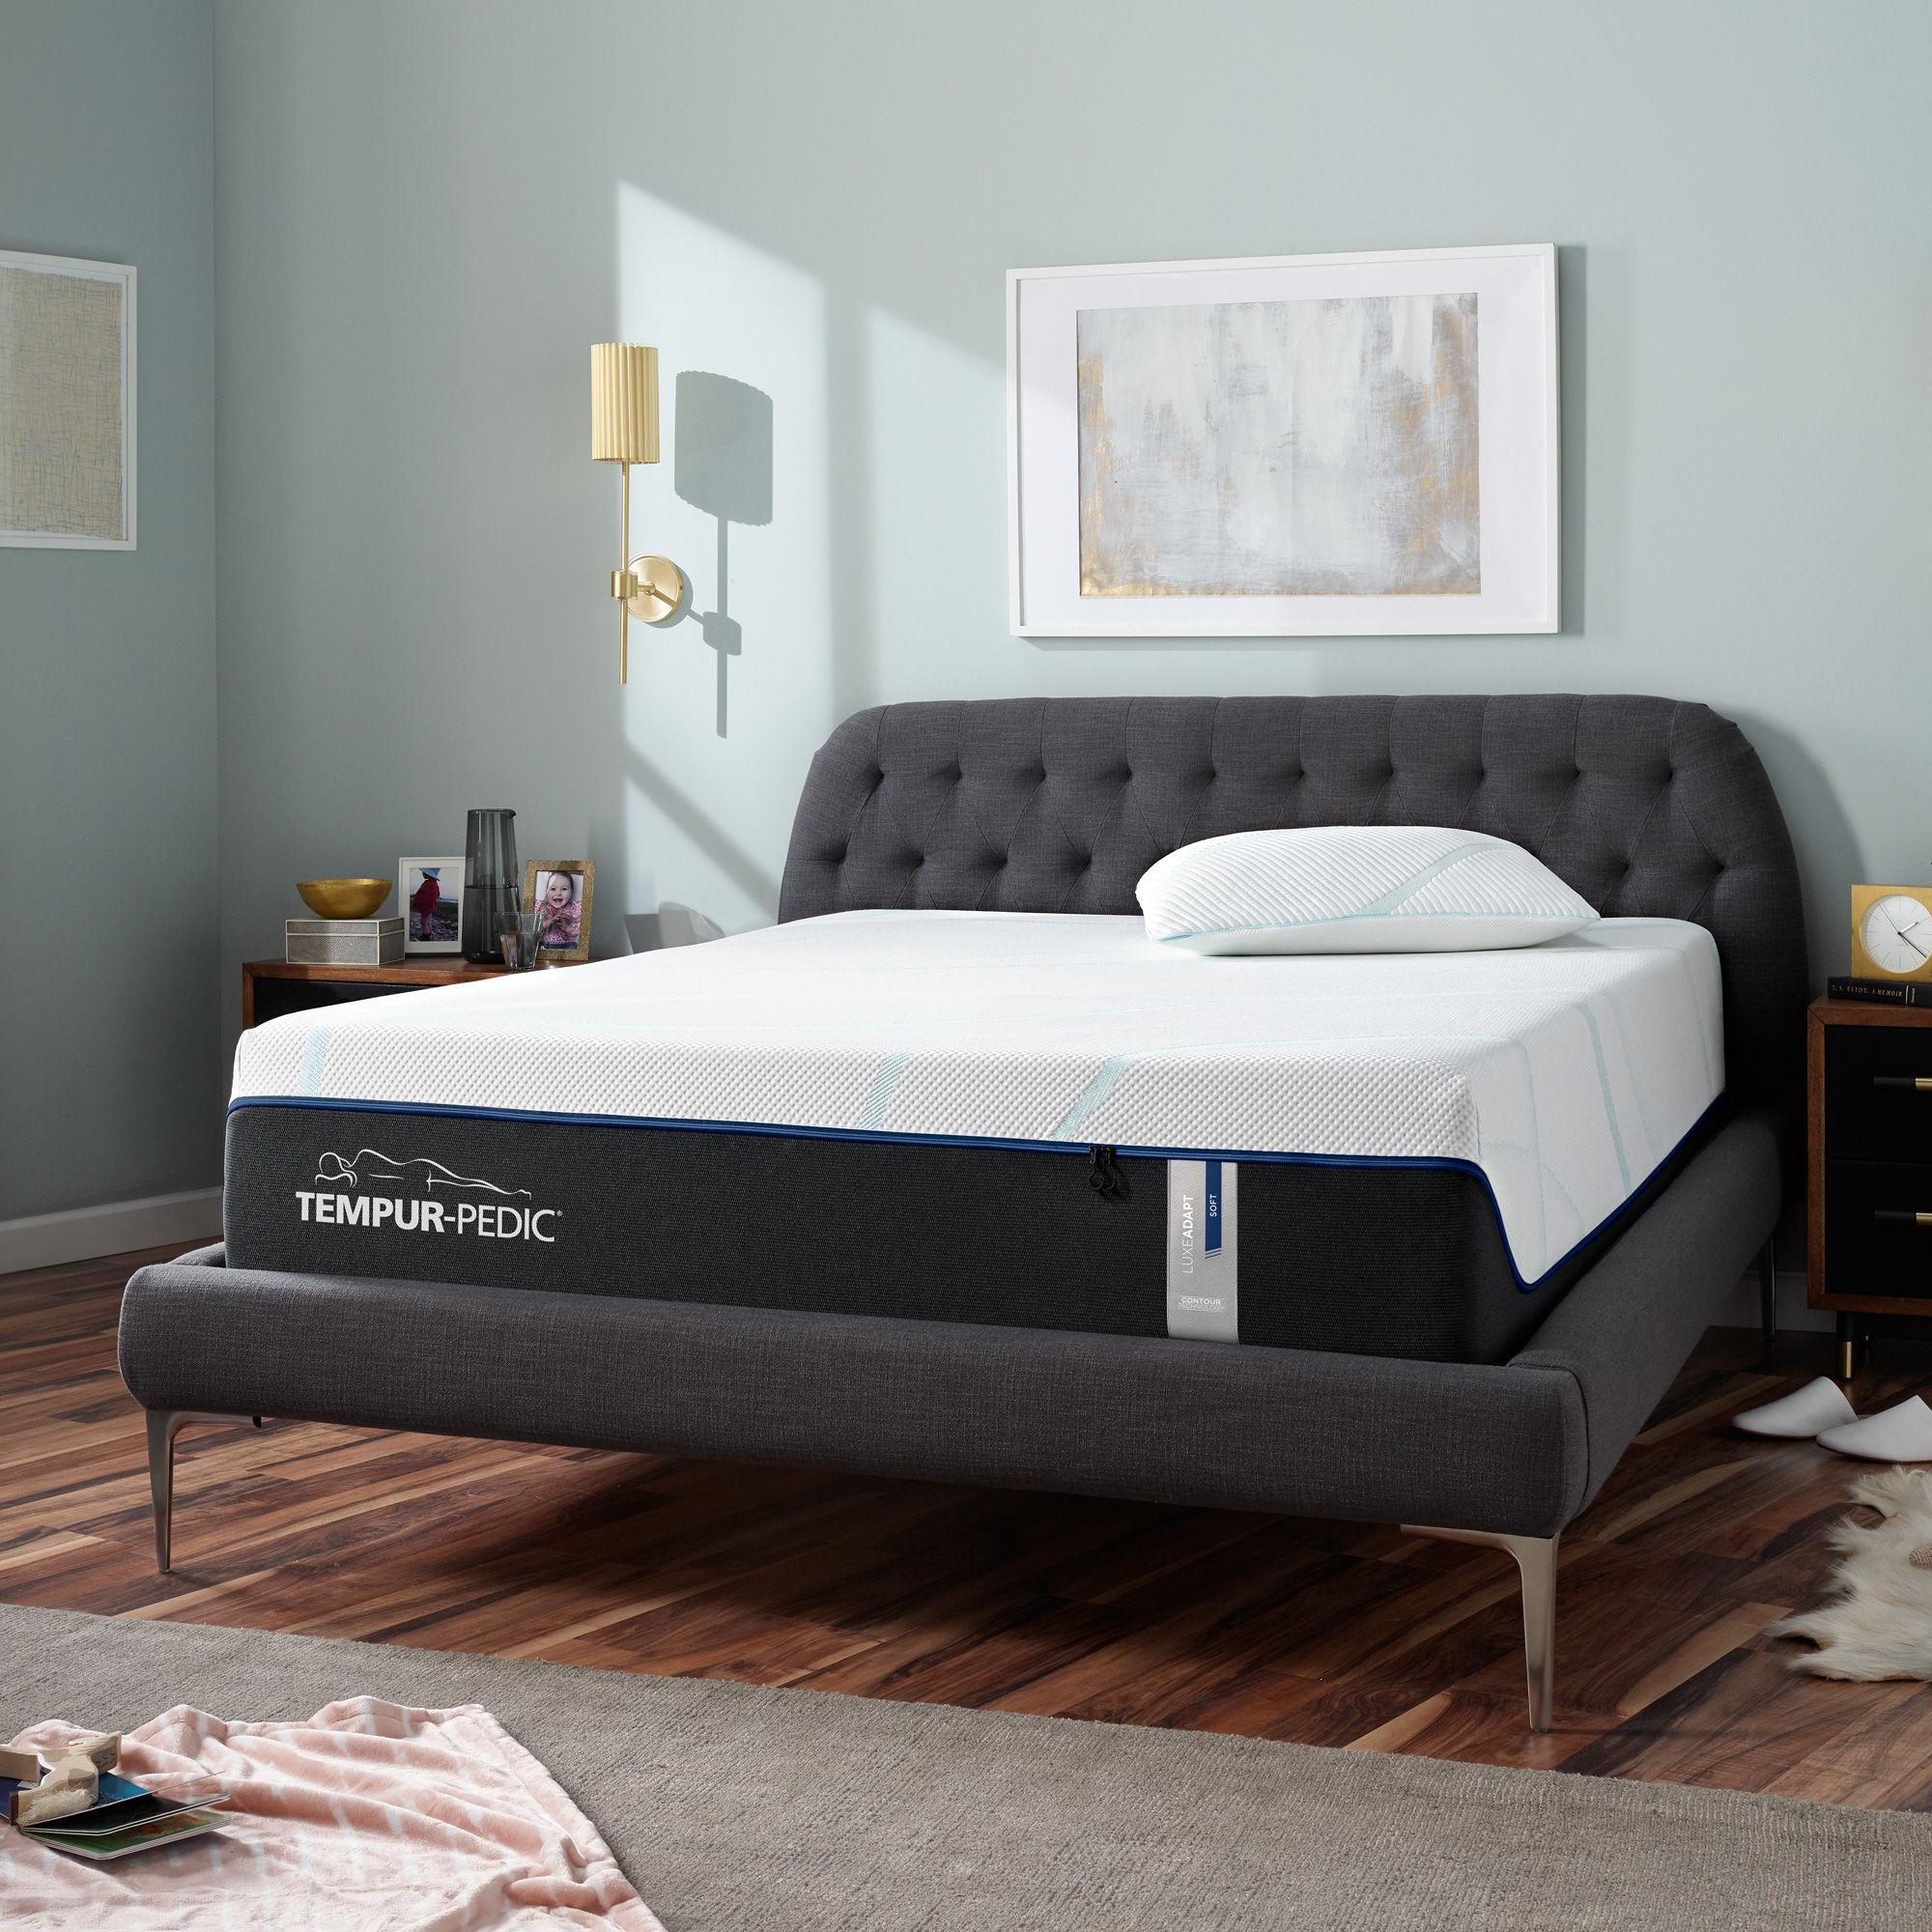 tempurpedic mattress tempur-luxeadapt